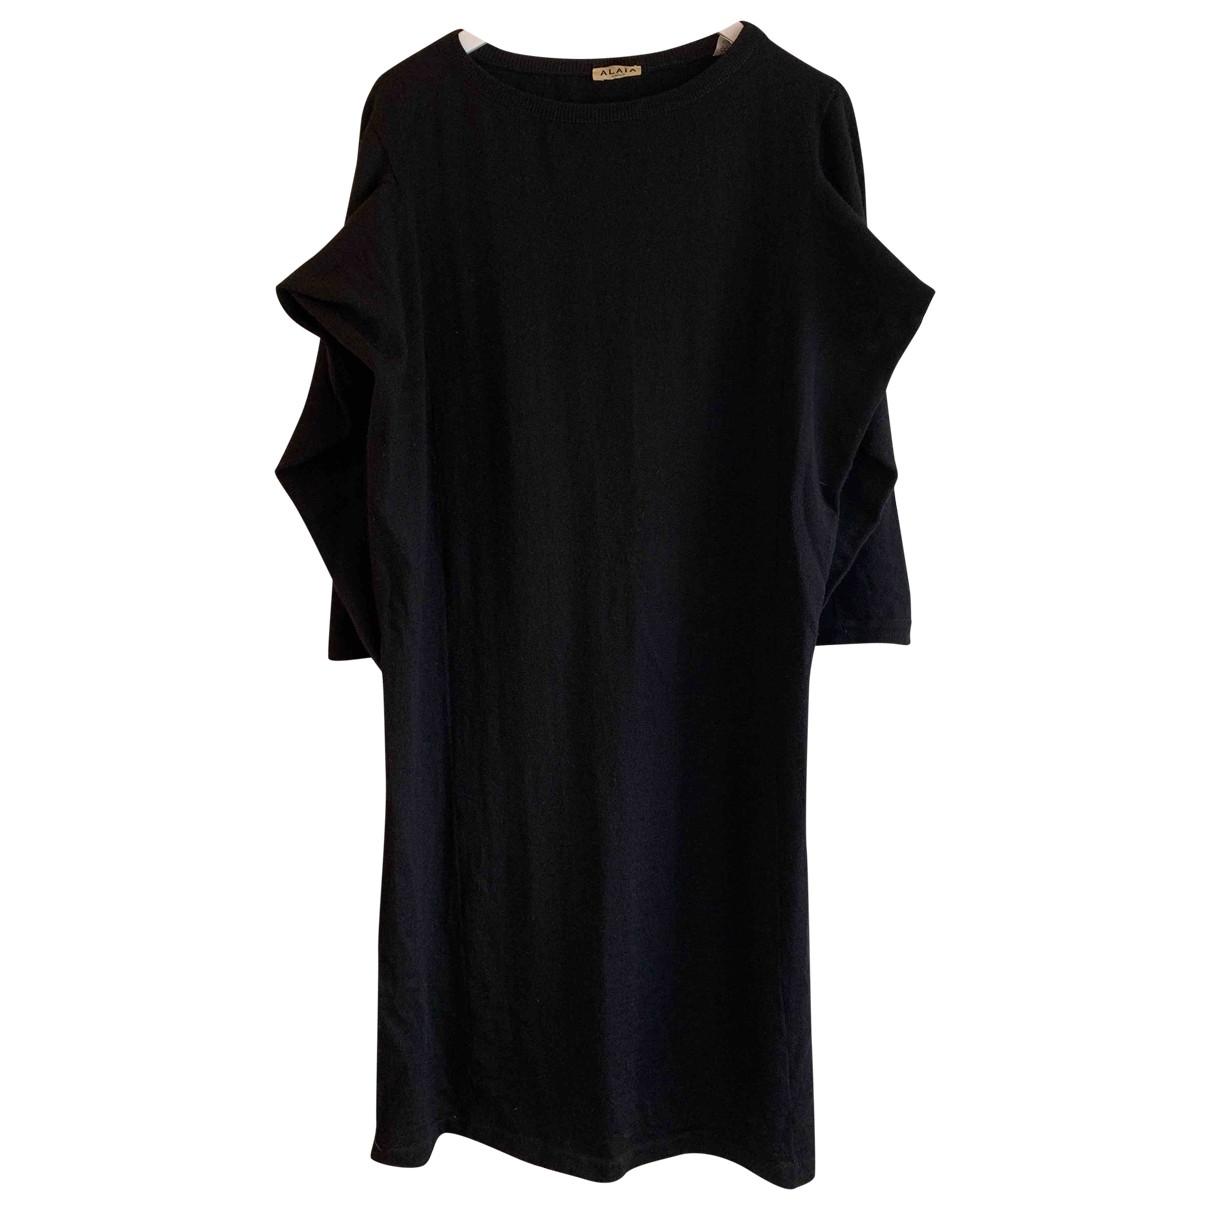 Alaïa \N Black Wool dress for Women M International